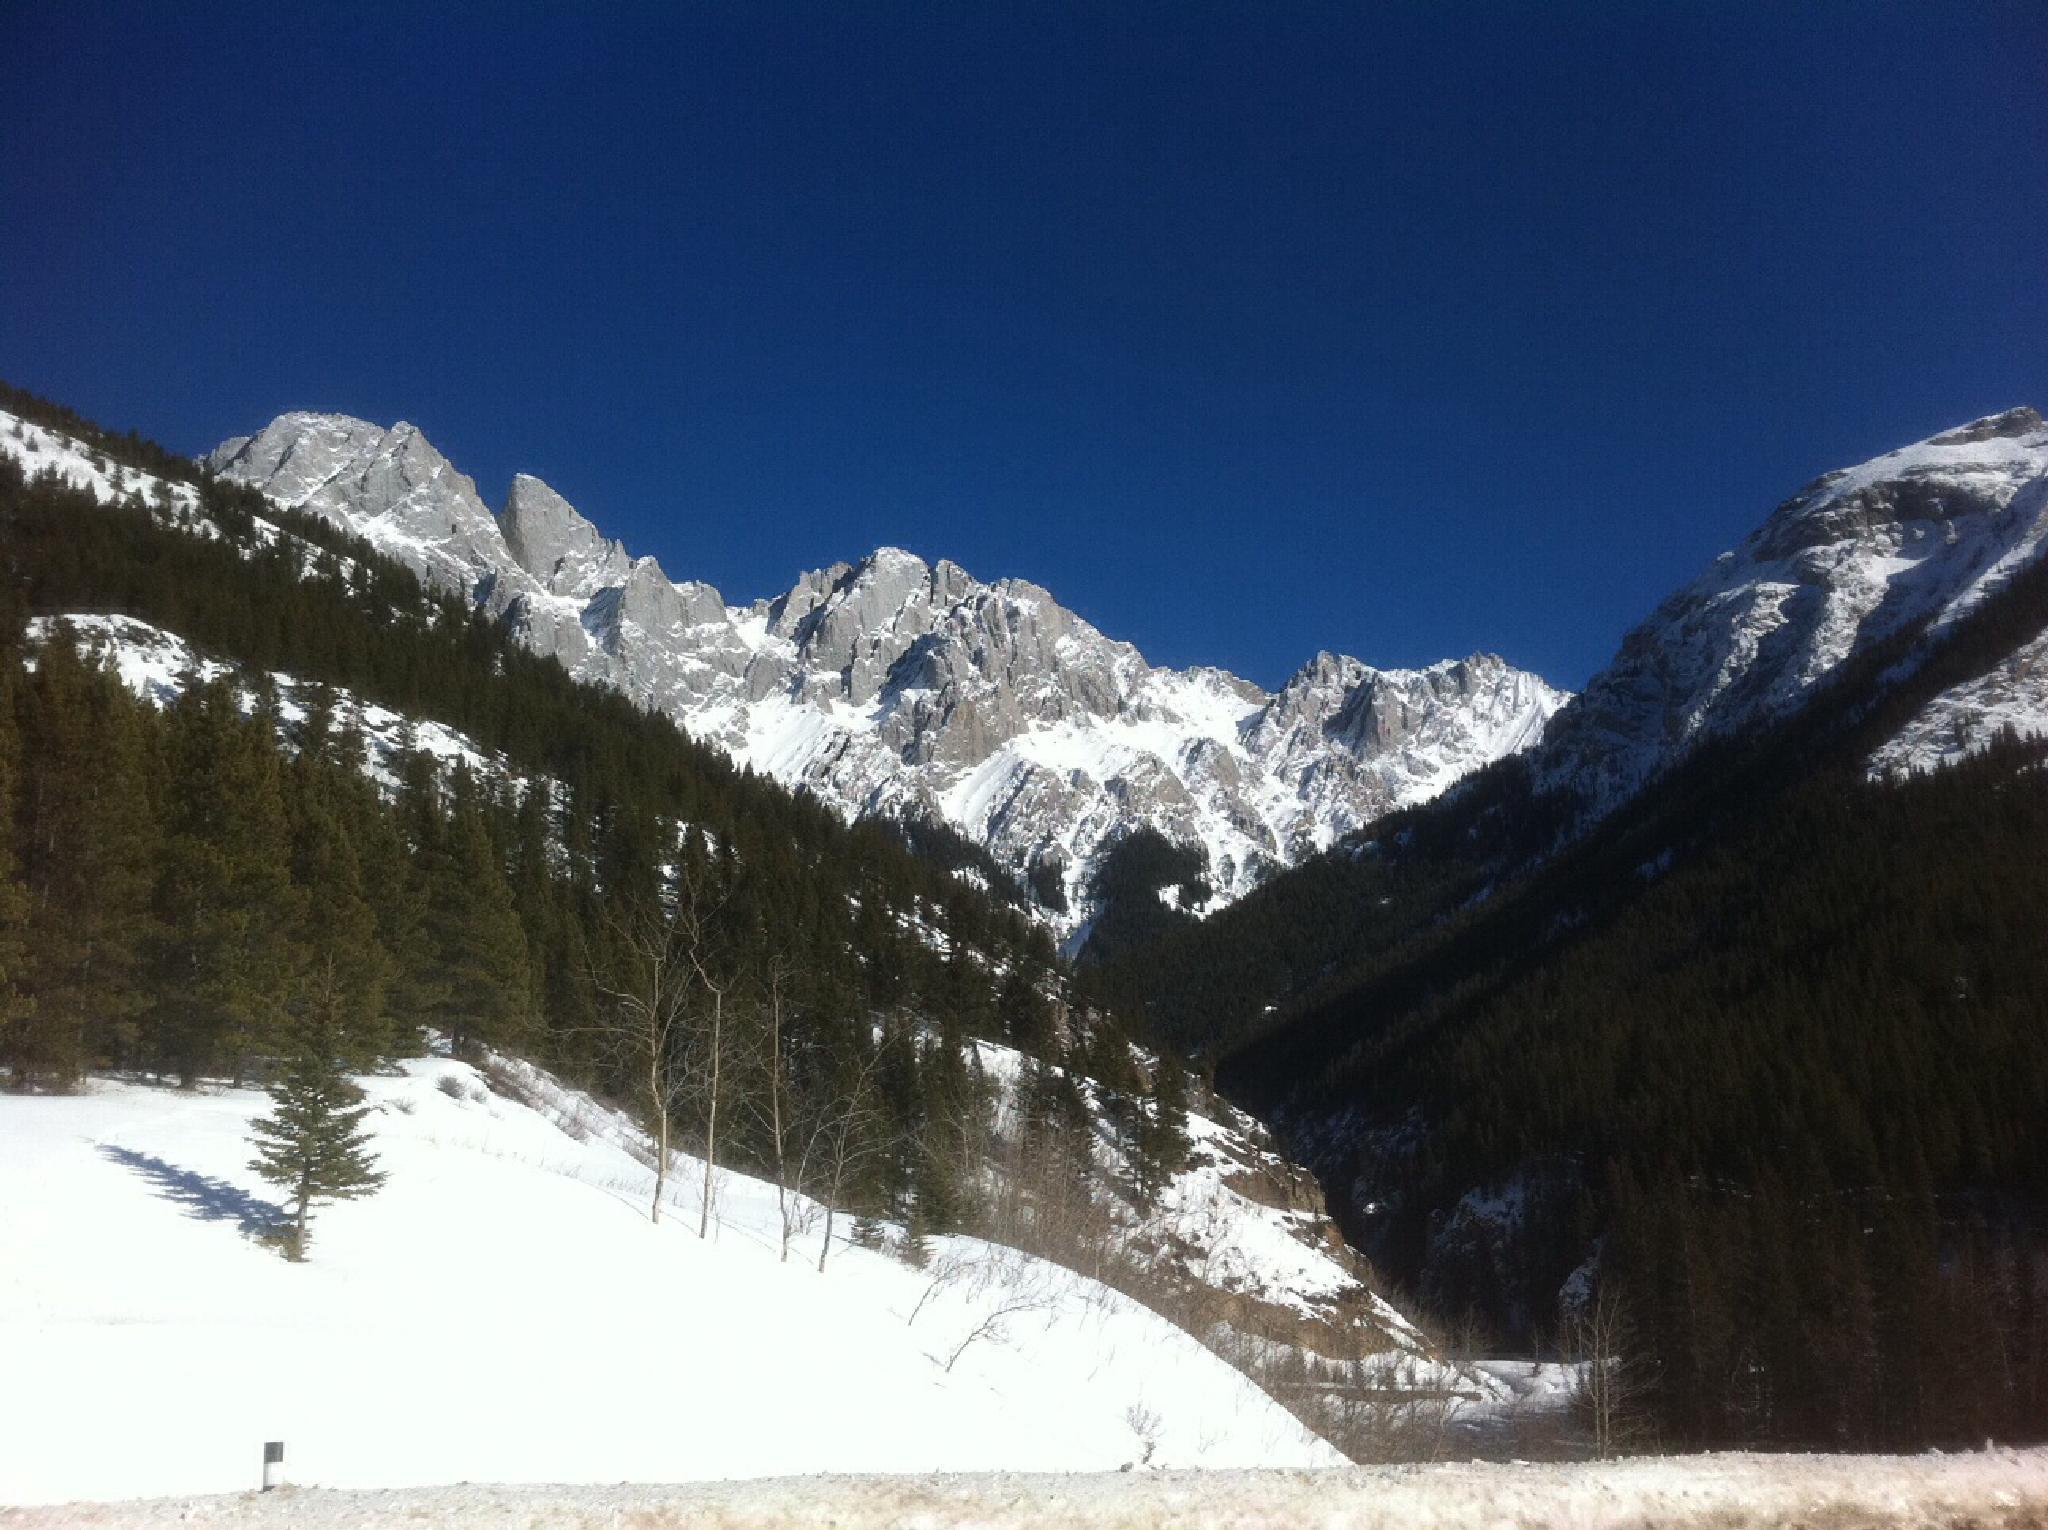 Blue Sky, Winter Mountain by 76Spitfire